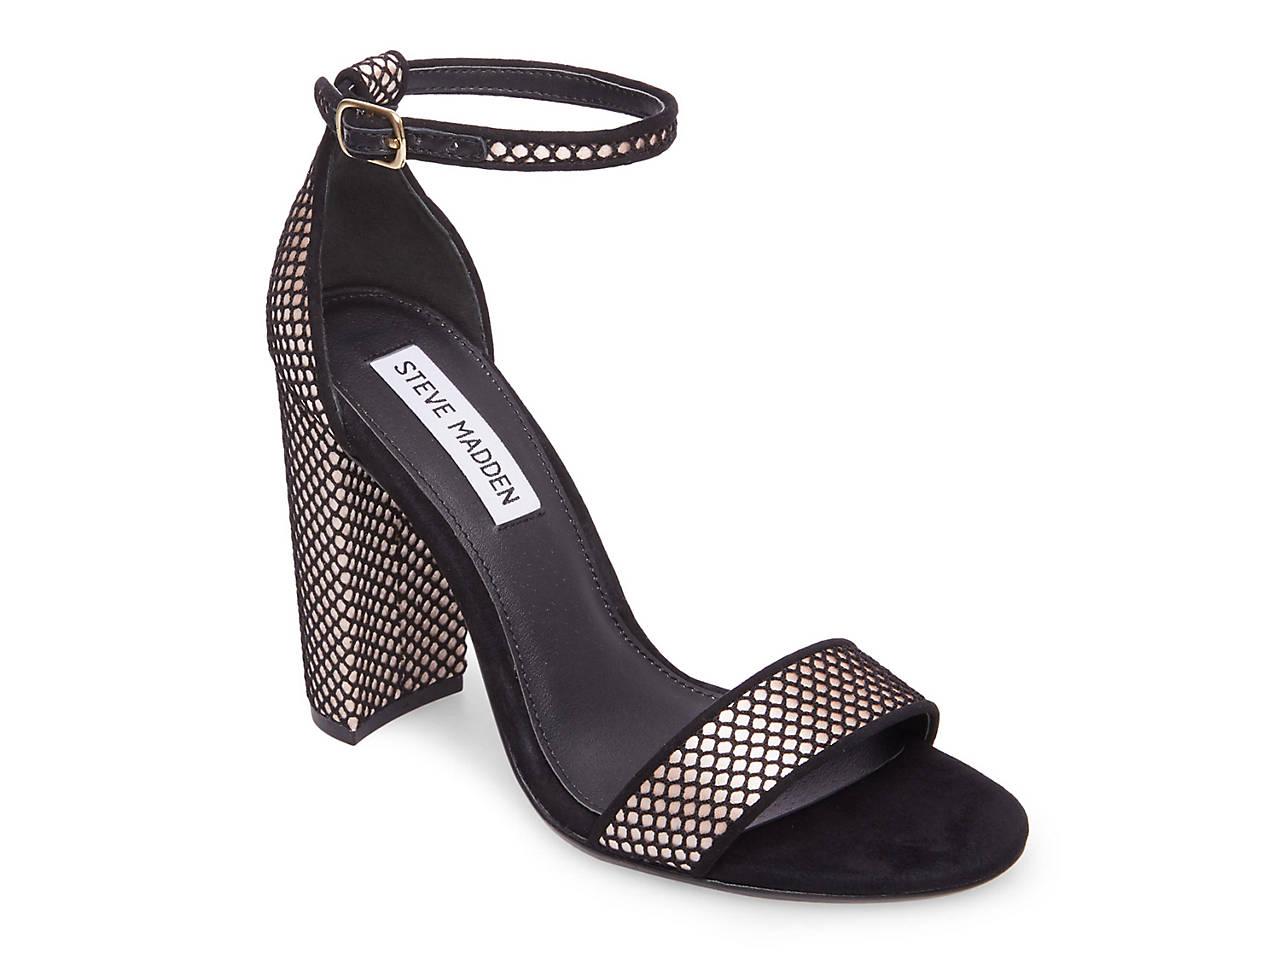 be44a6d6155e2 Steve Madden Carrson Sandal Women s Shoes